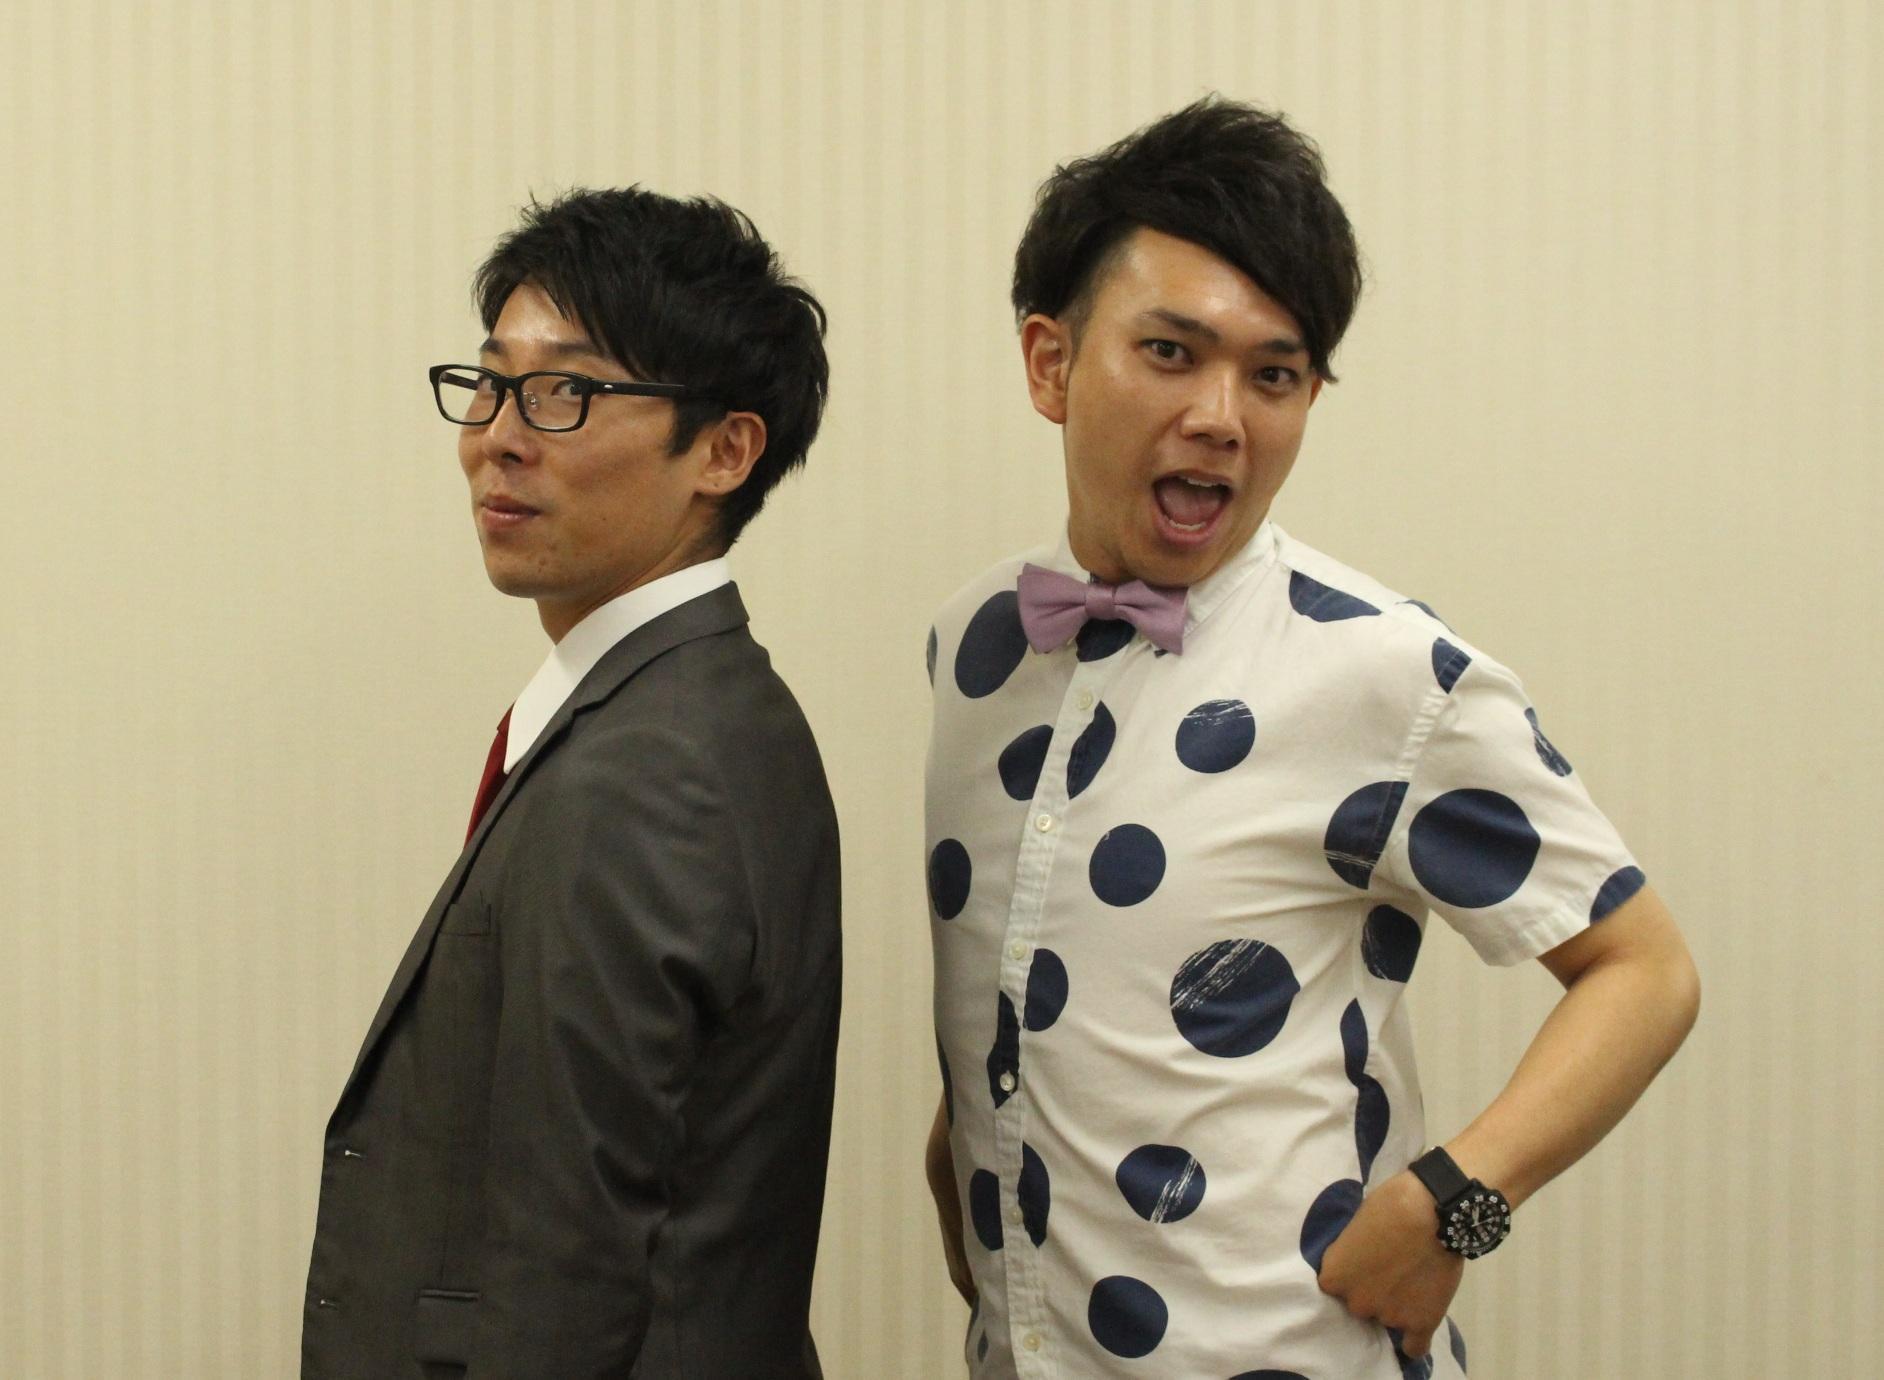 http://47web.jp/shizuoka/uploads/2ba9e740583c4465db6cdb69692267982d3fe61b.JPG